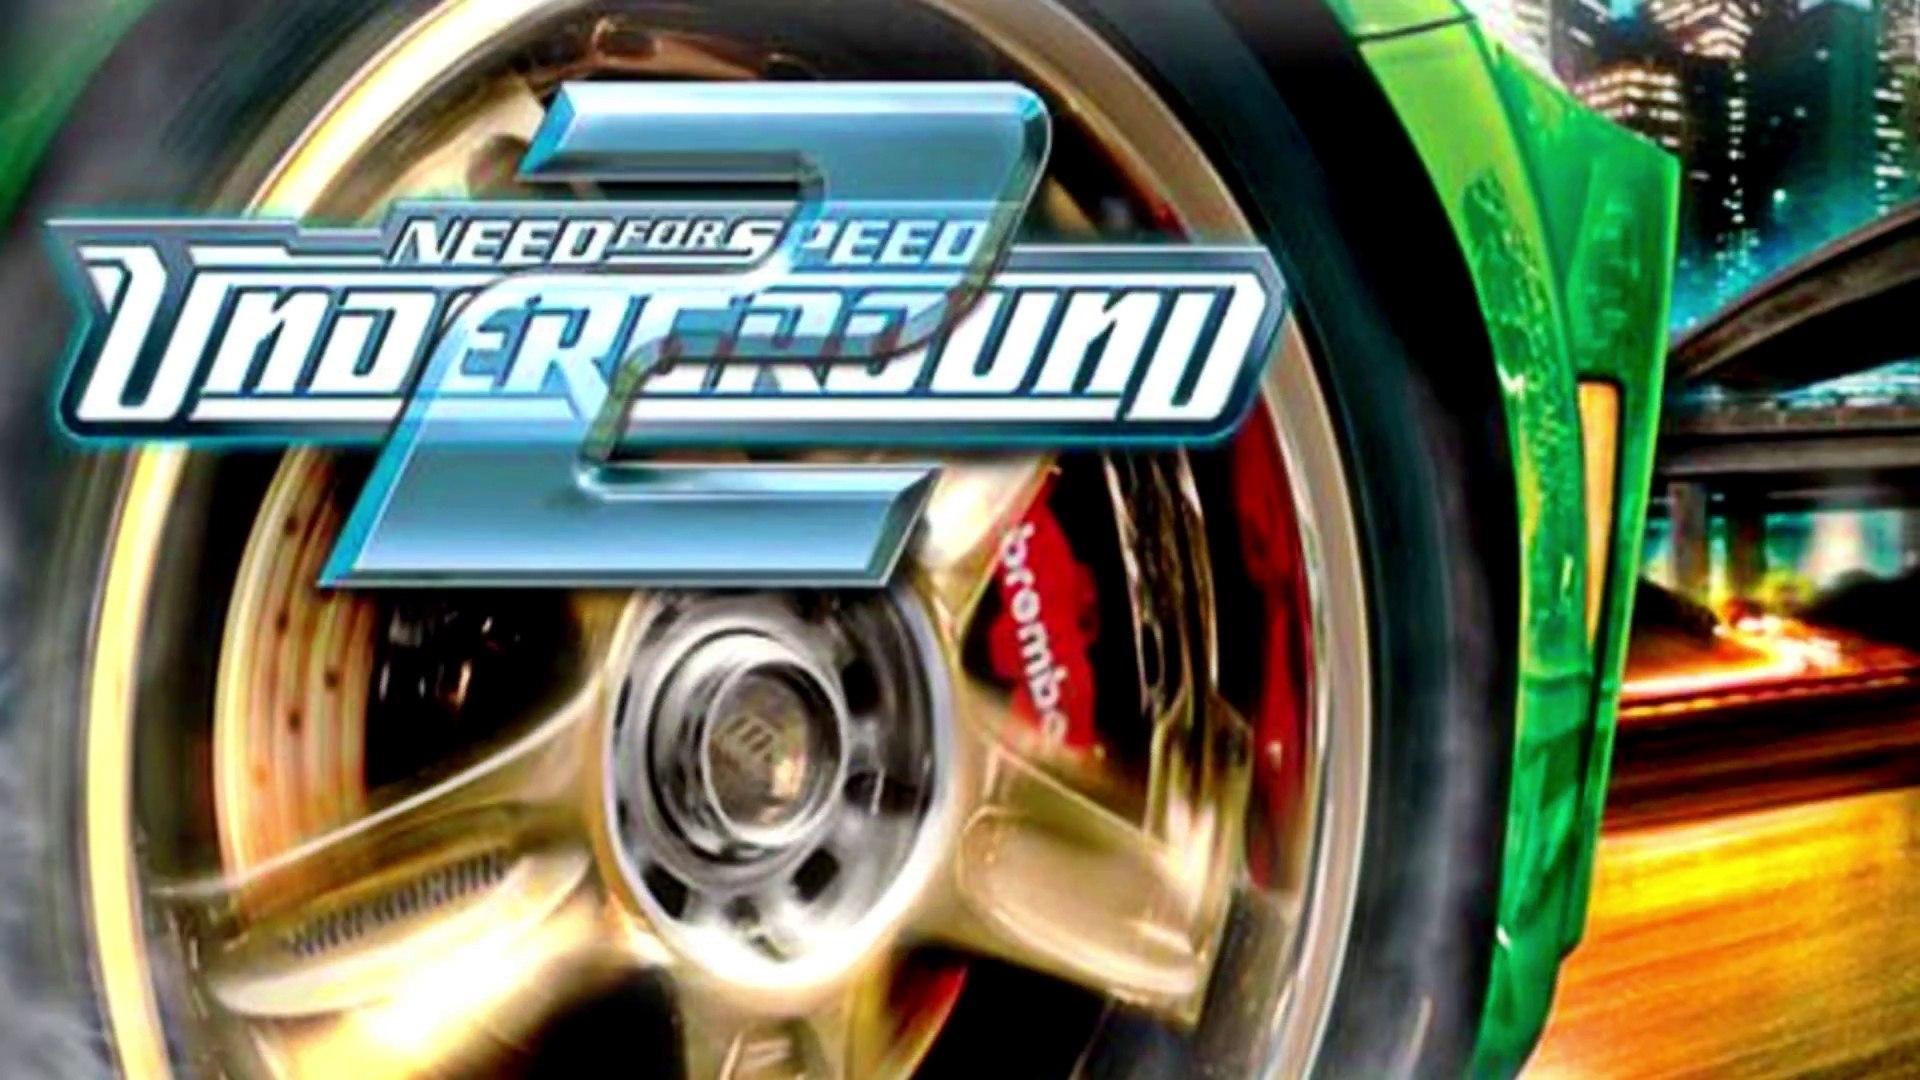 Toyota Celica Underground Racing League Need For Speed